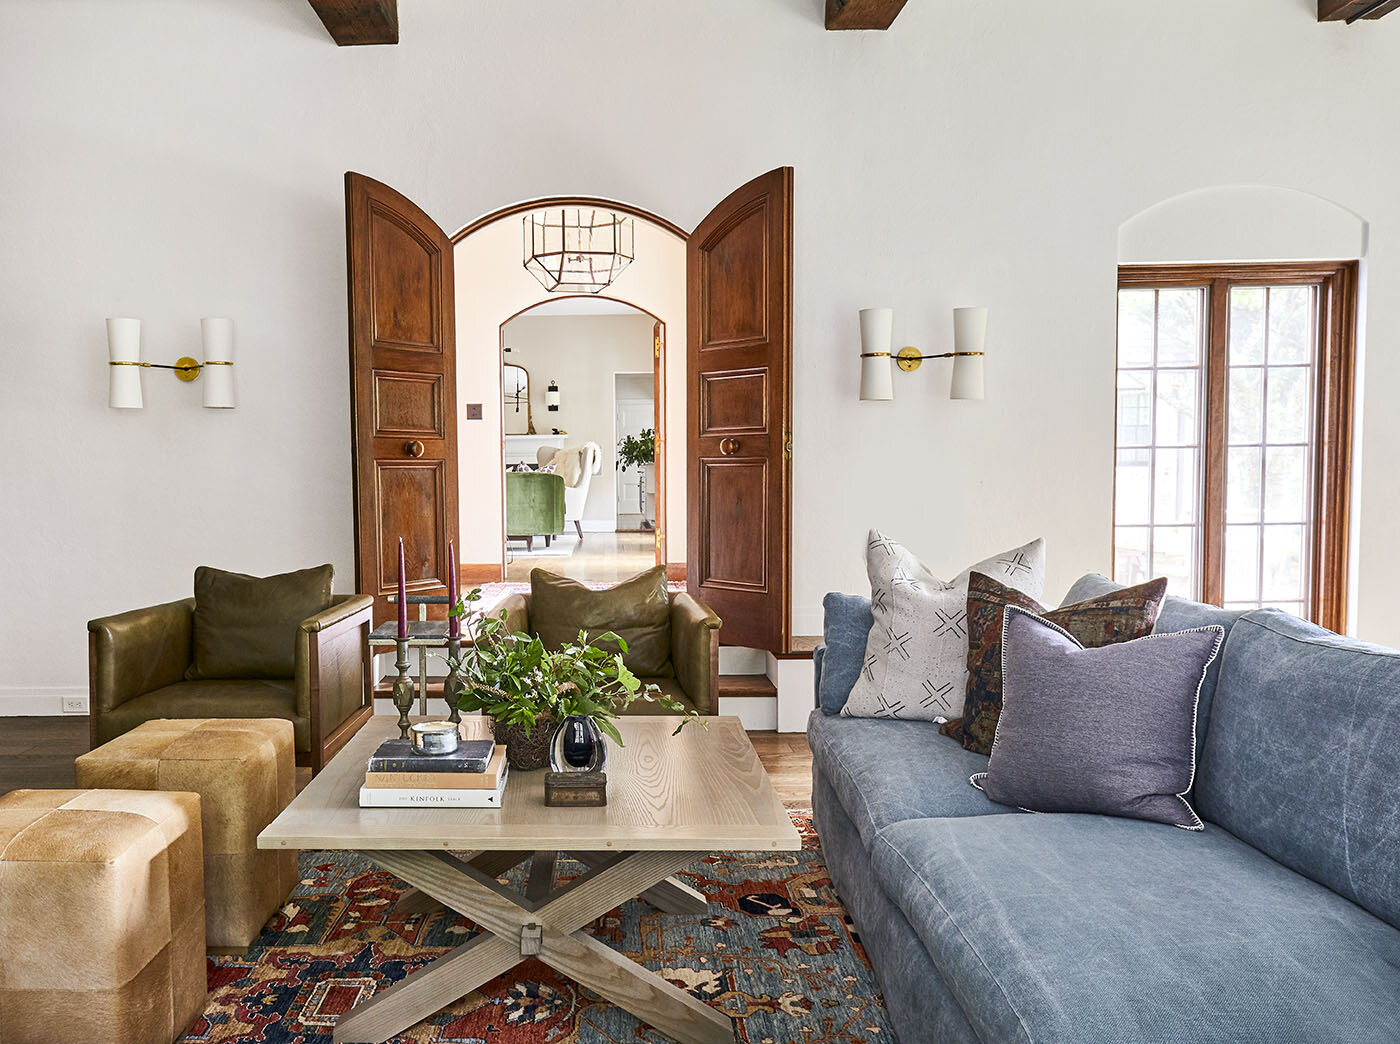 mackenzie-and-company-boston-westwood-interior-design-living-room-style-1